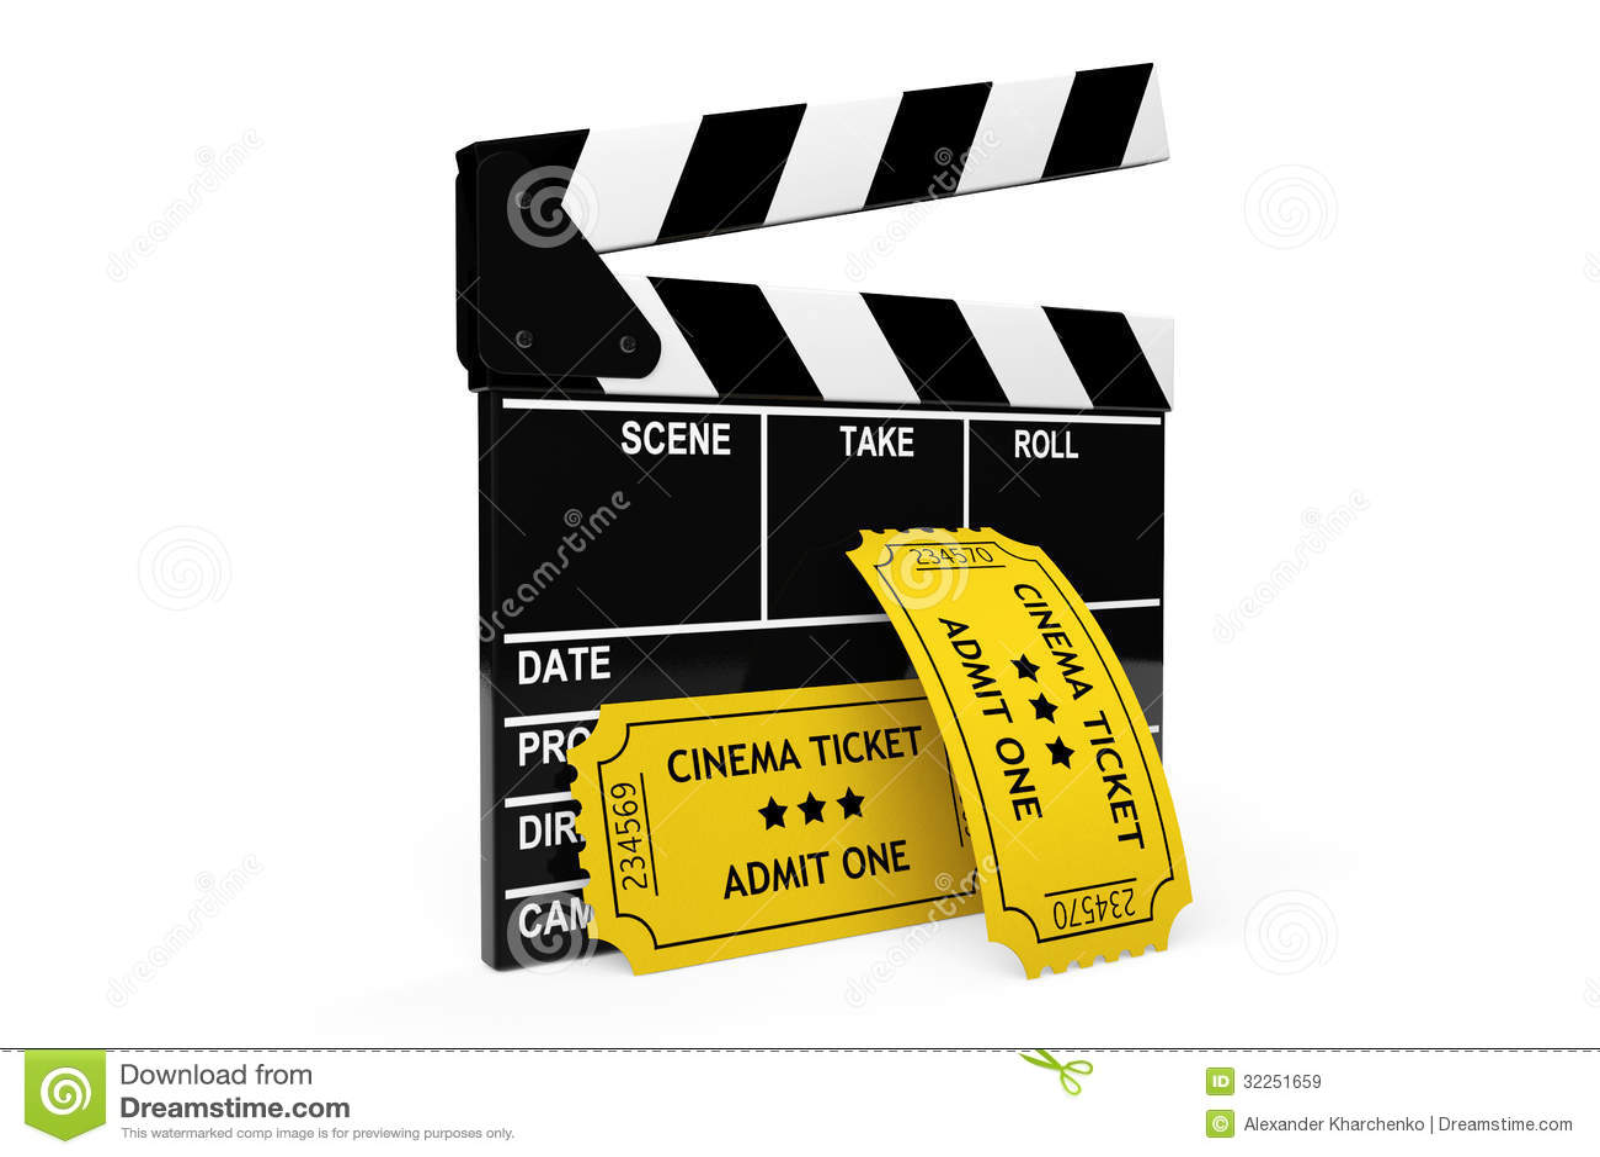 cinema ticket to admit one - Thetoastmaster.co